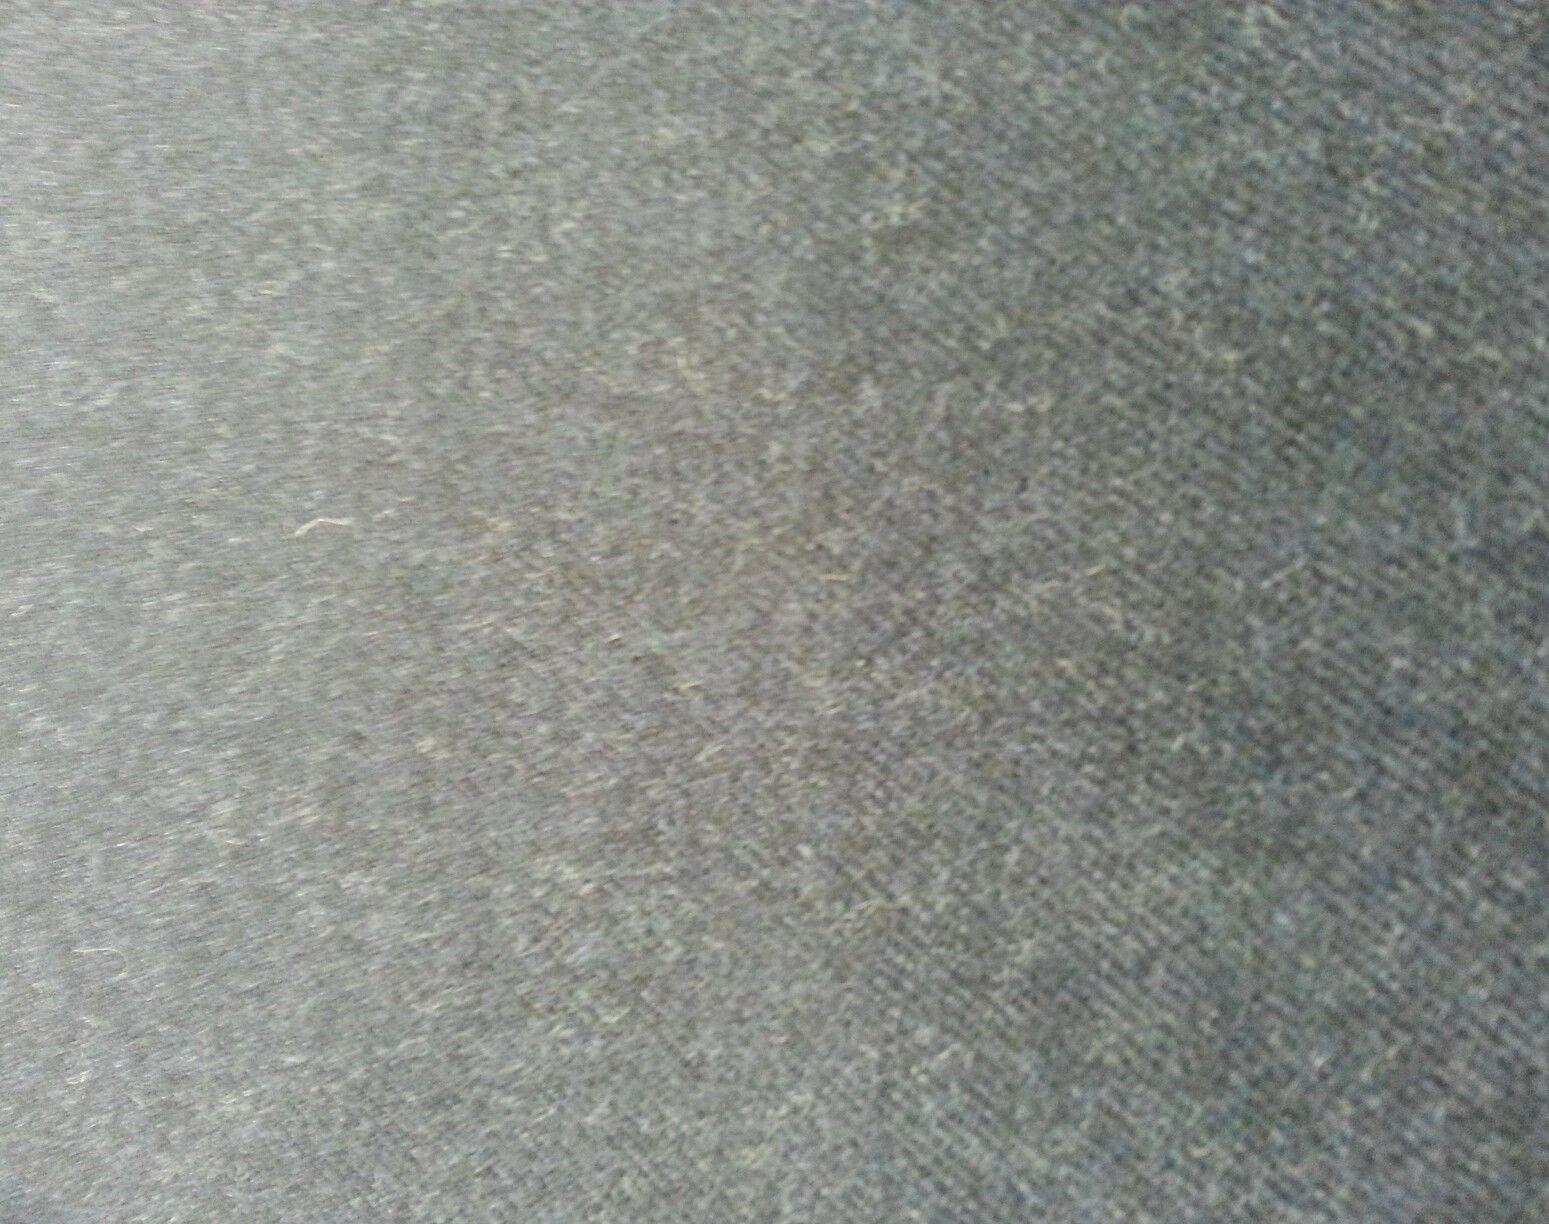 7 YARD  Blue GreyTropical 120'S ITALIAN FINE WOOL MSRP $899 USA SELLER!